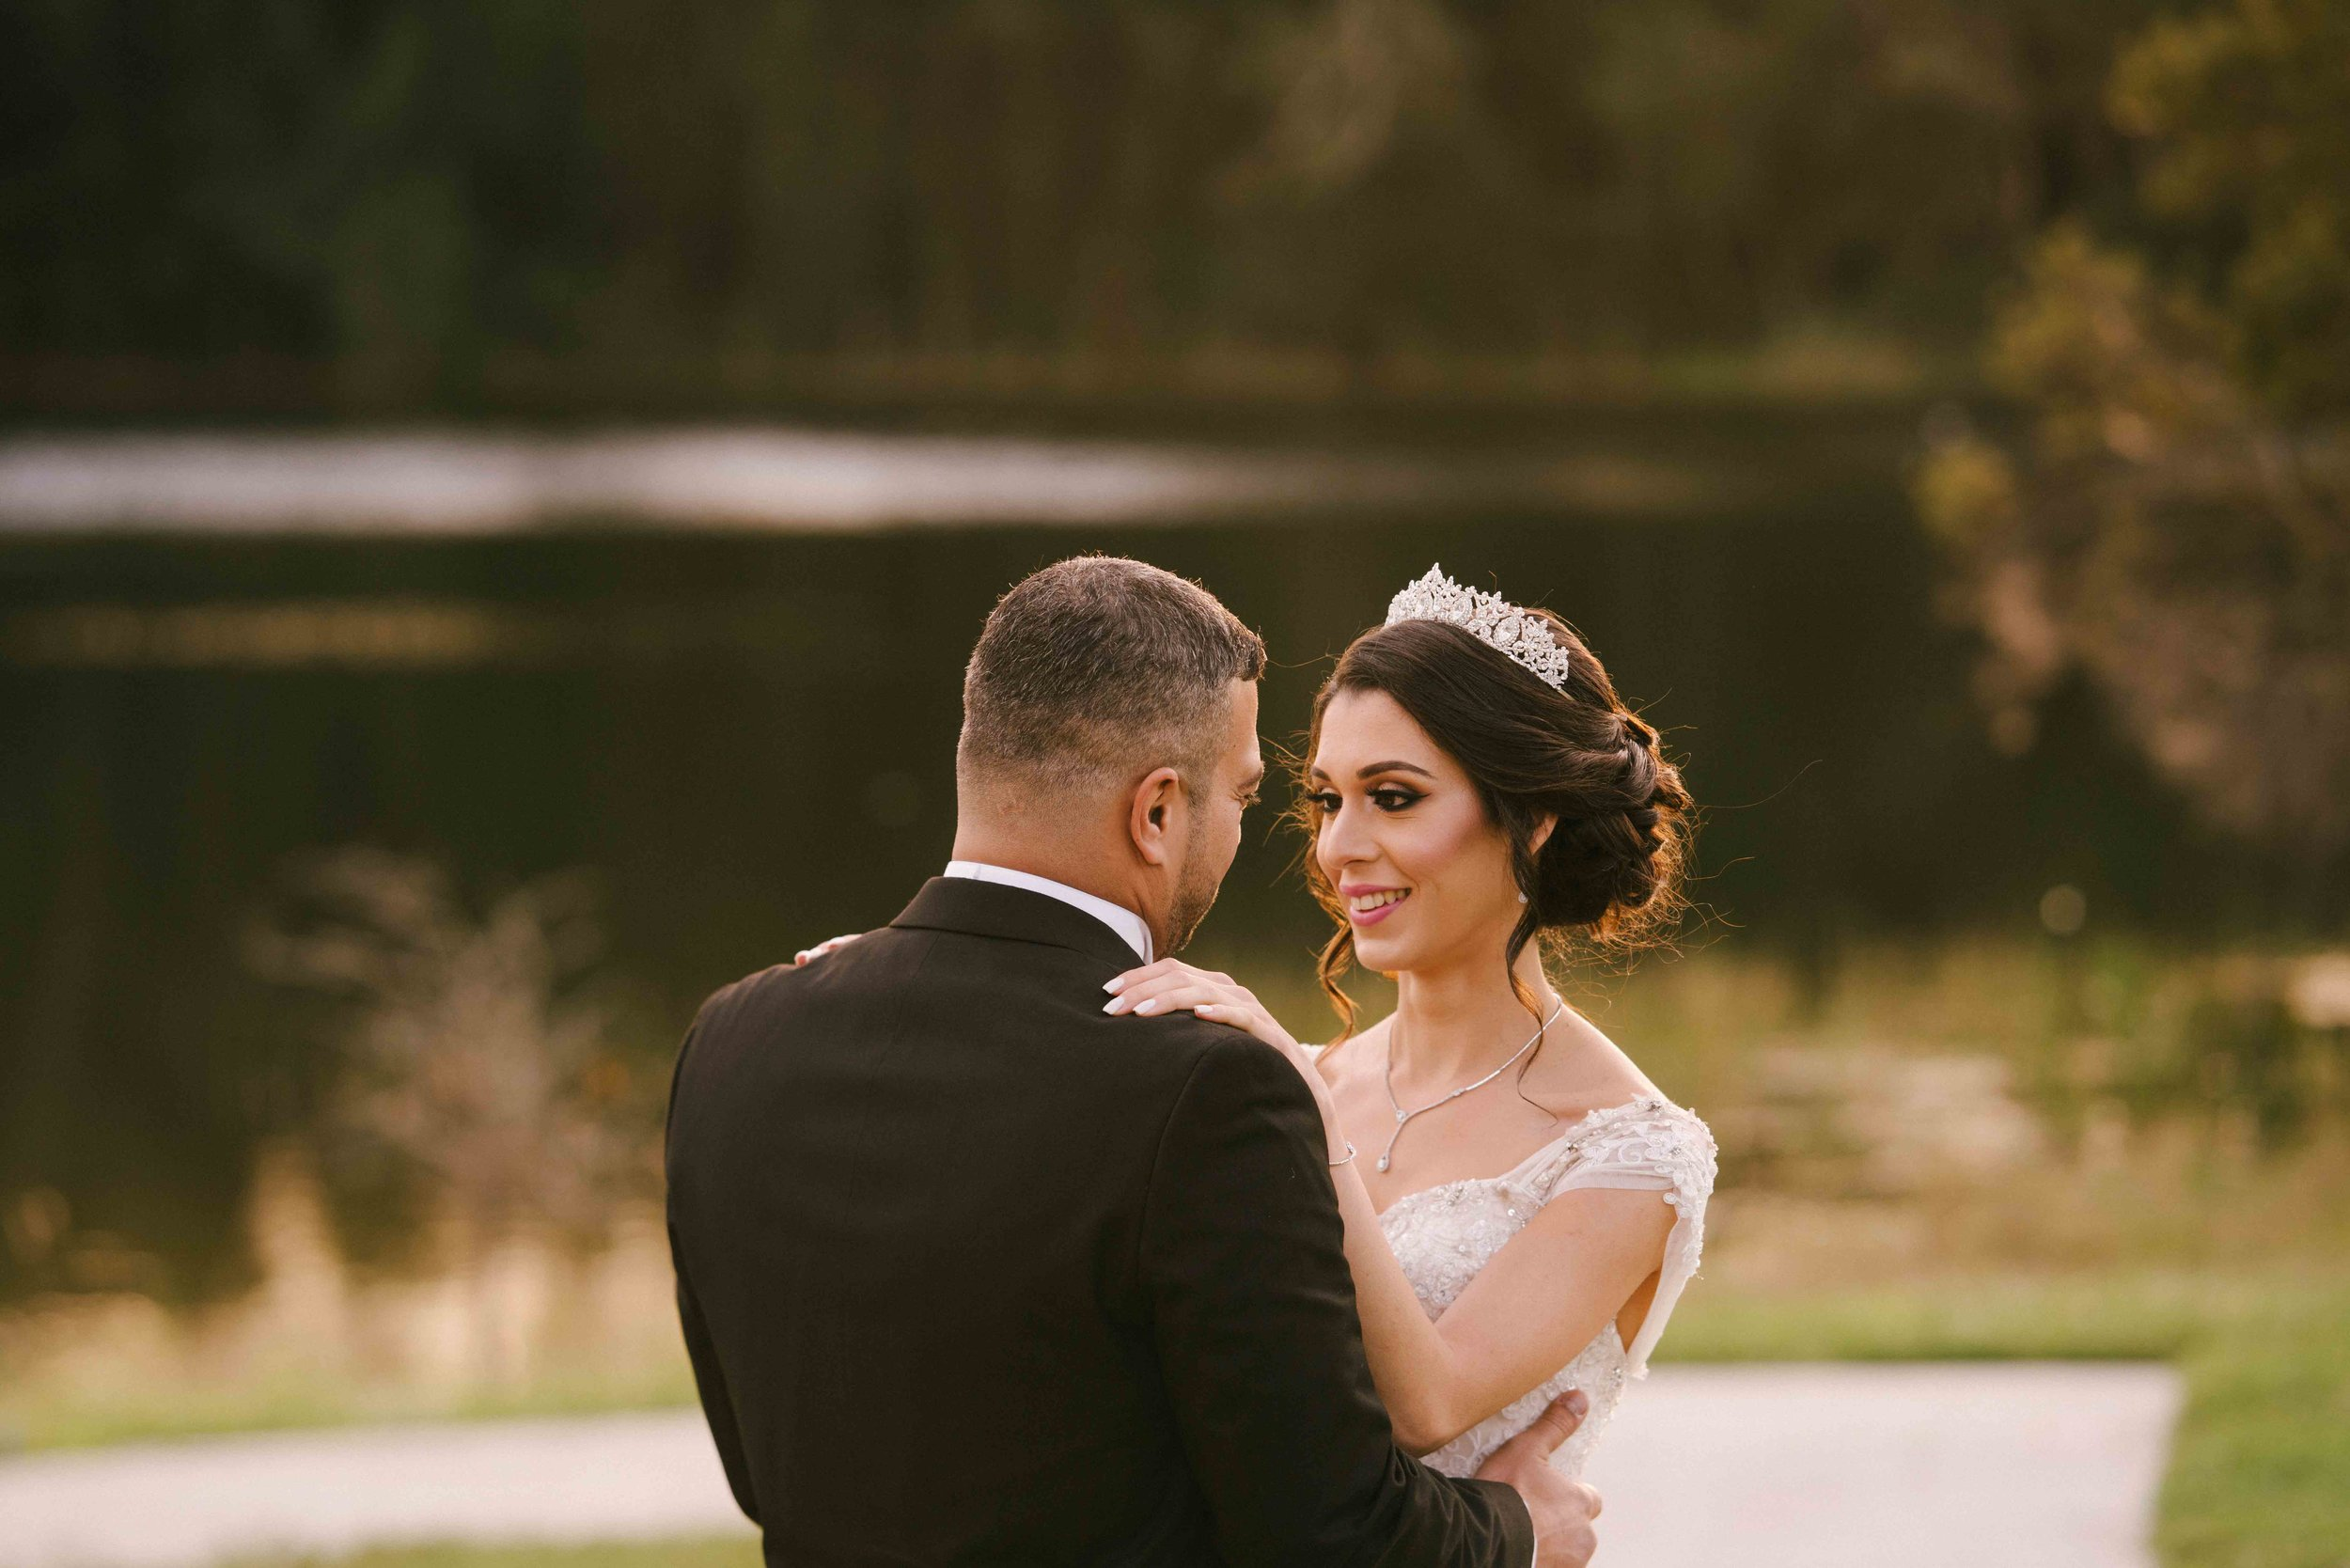 MIAMI ARABIC WEDDING VIDEO